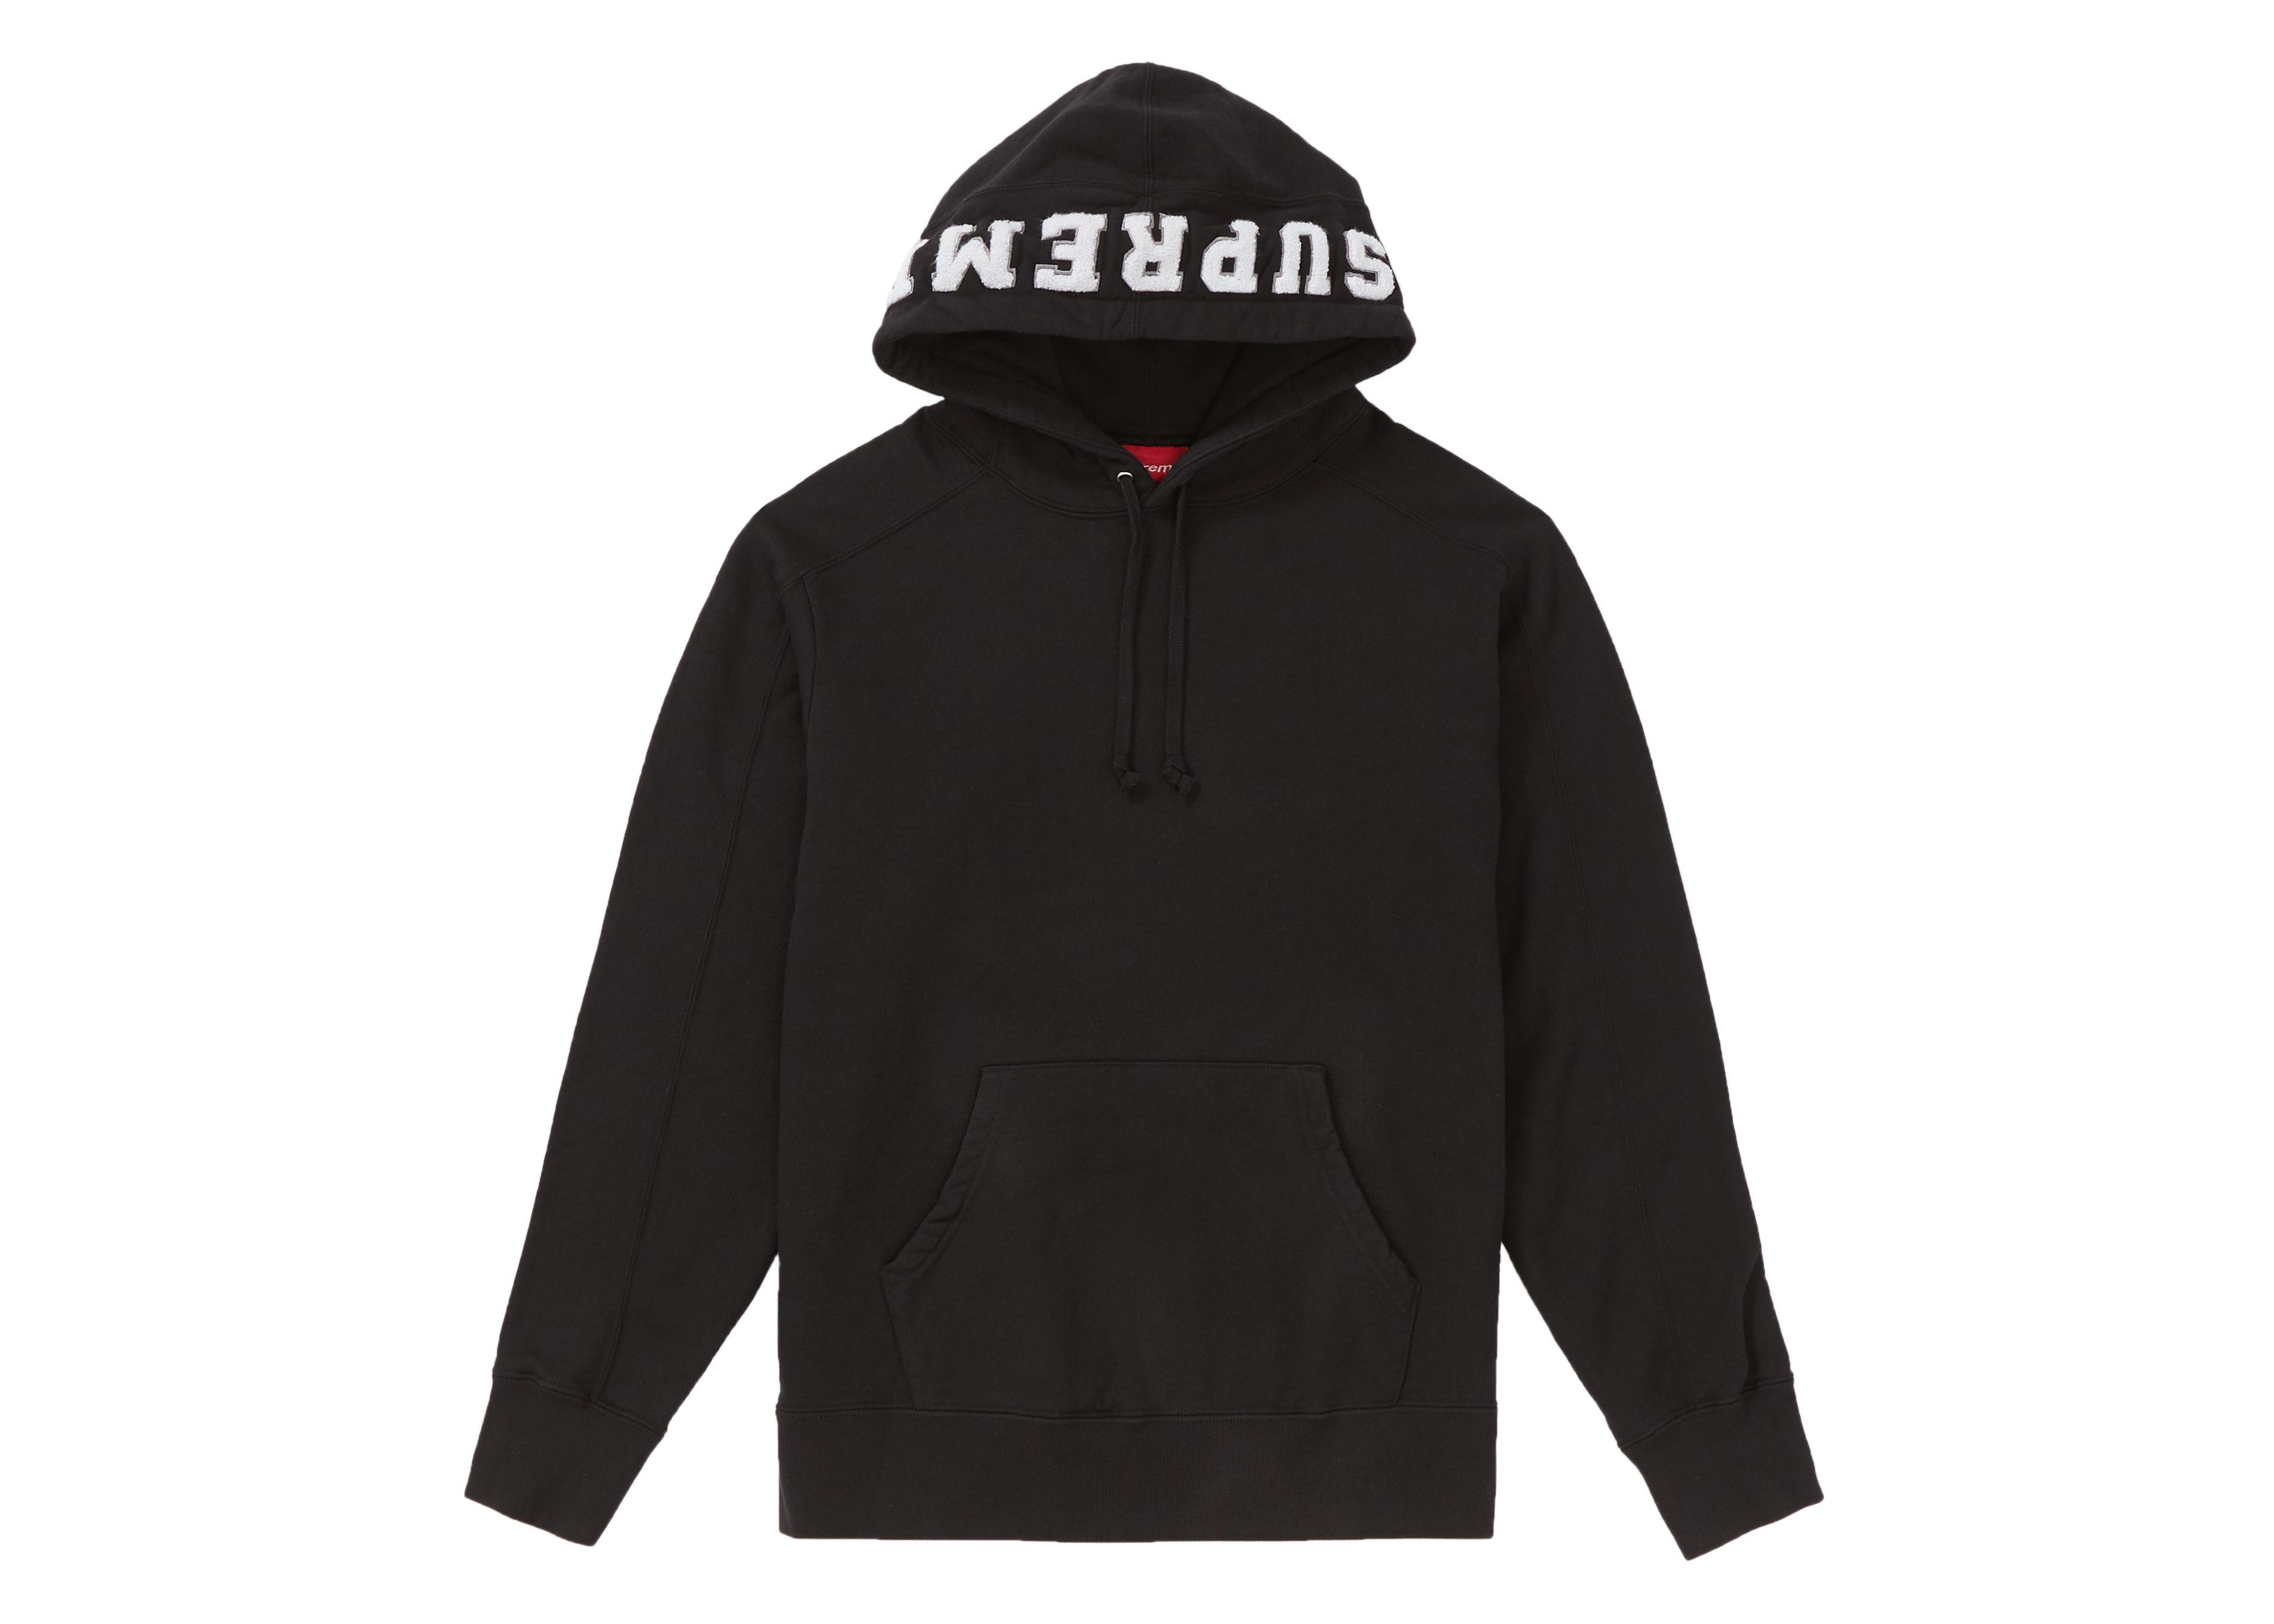 Supreme Paneled Hooded Sweatshirt Black Supreme Cloth Hooded Sweatshirts Black Sweatshirts Luxury Streetwear [ 2717 x 3804 Pixel ]